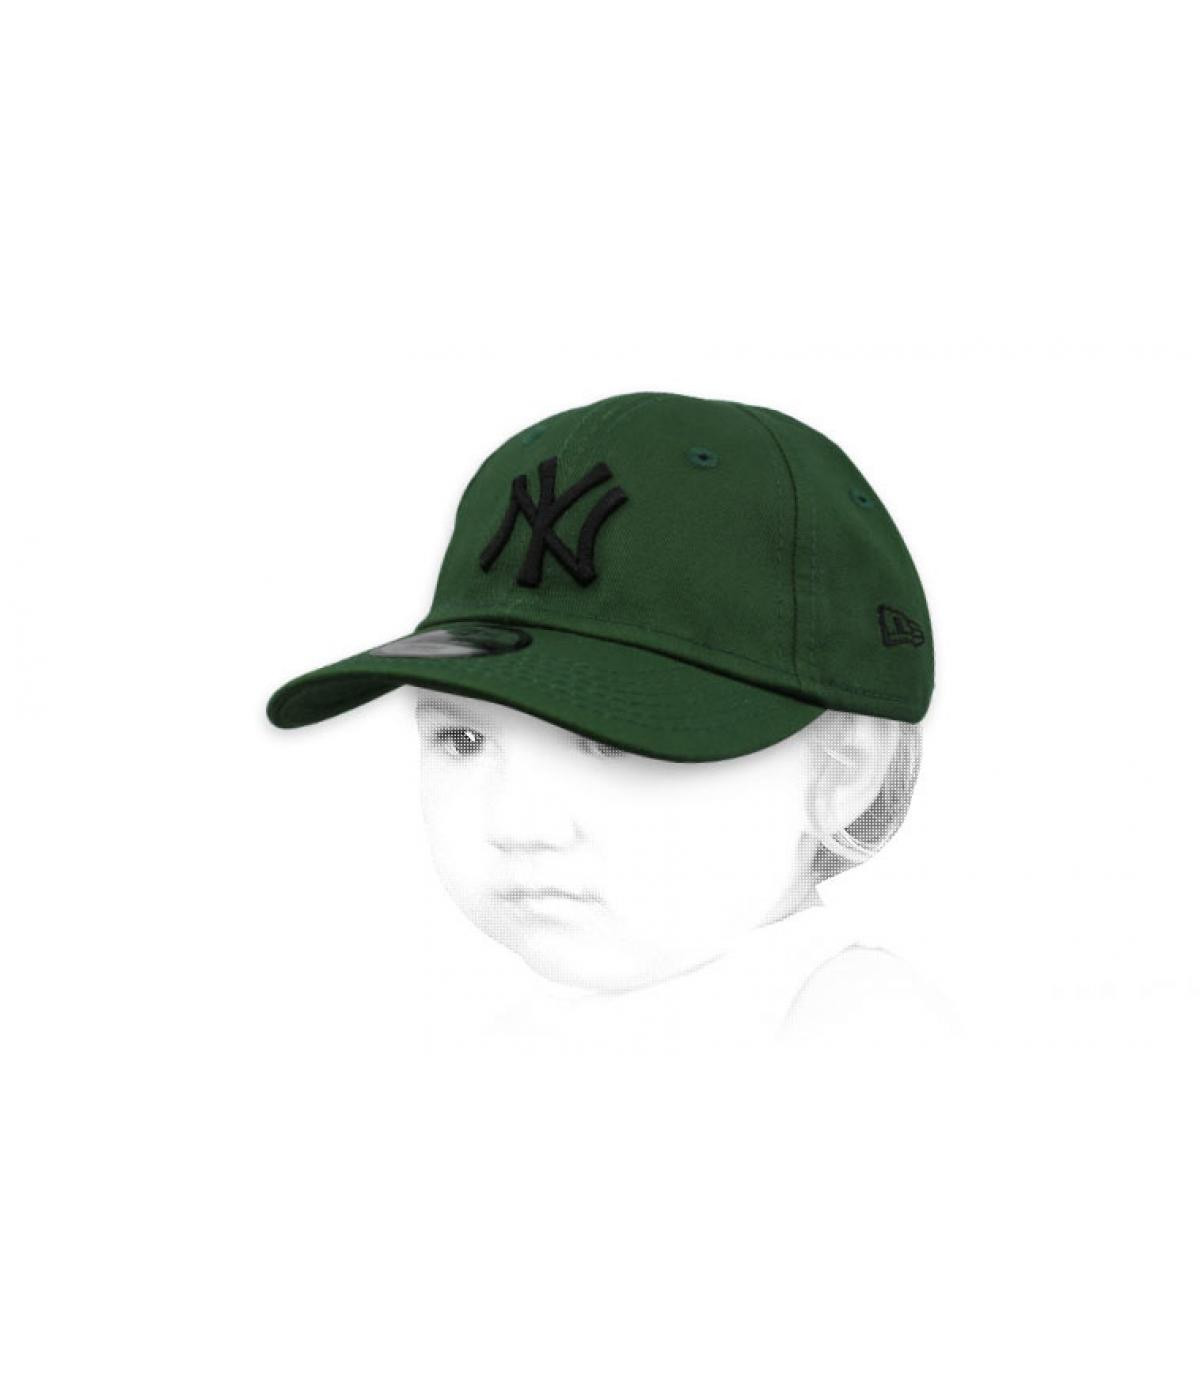 Berretta verde NY